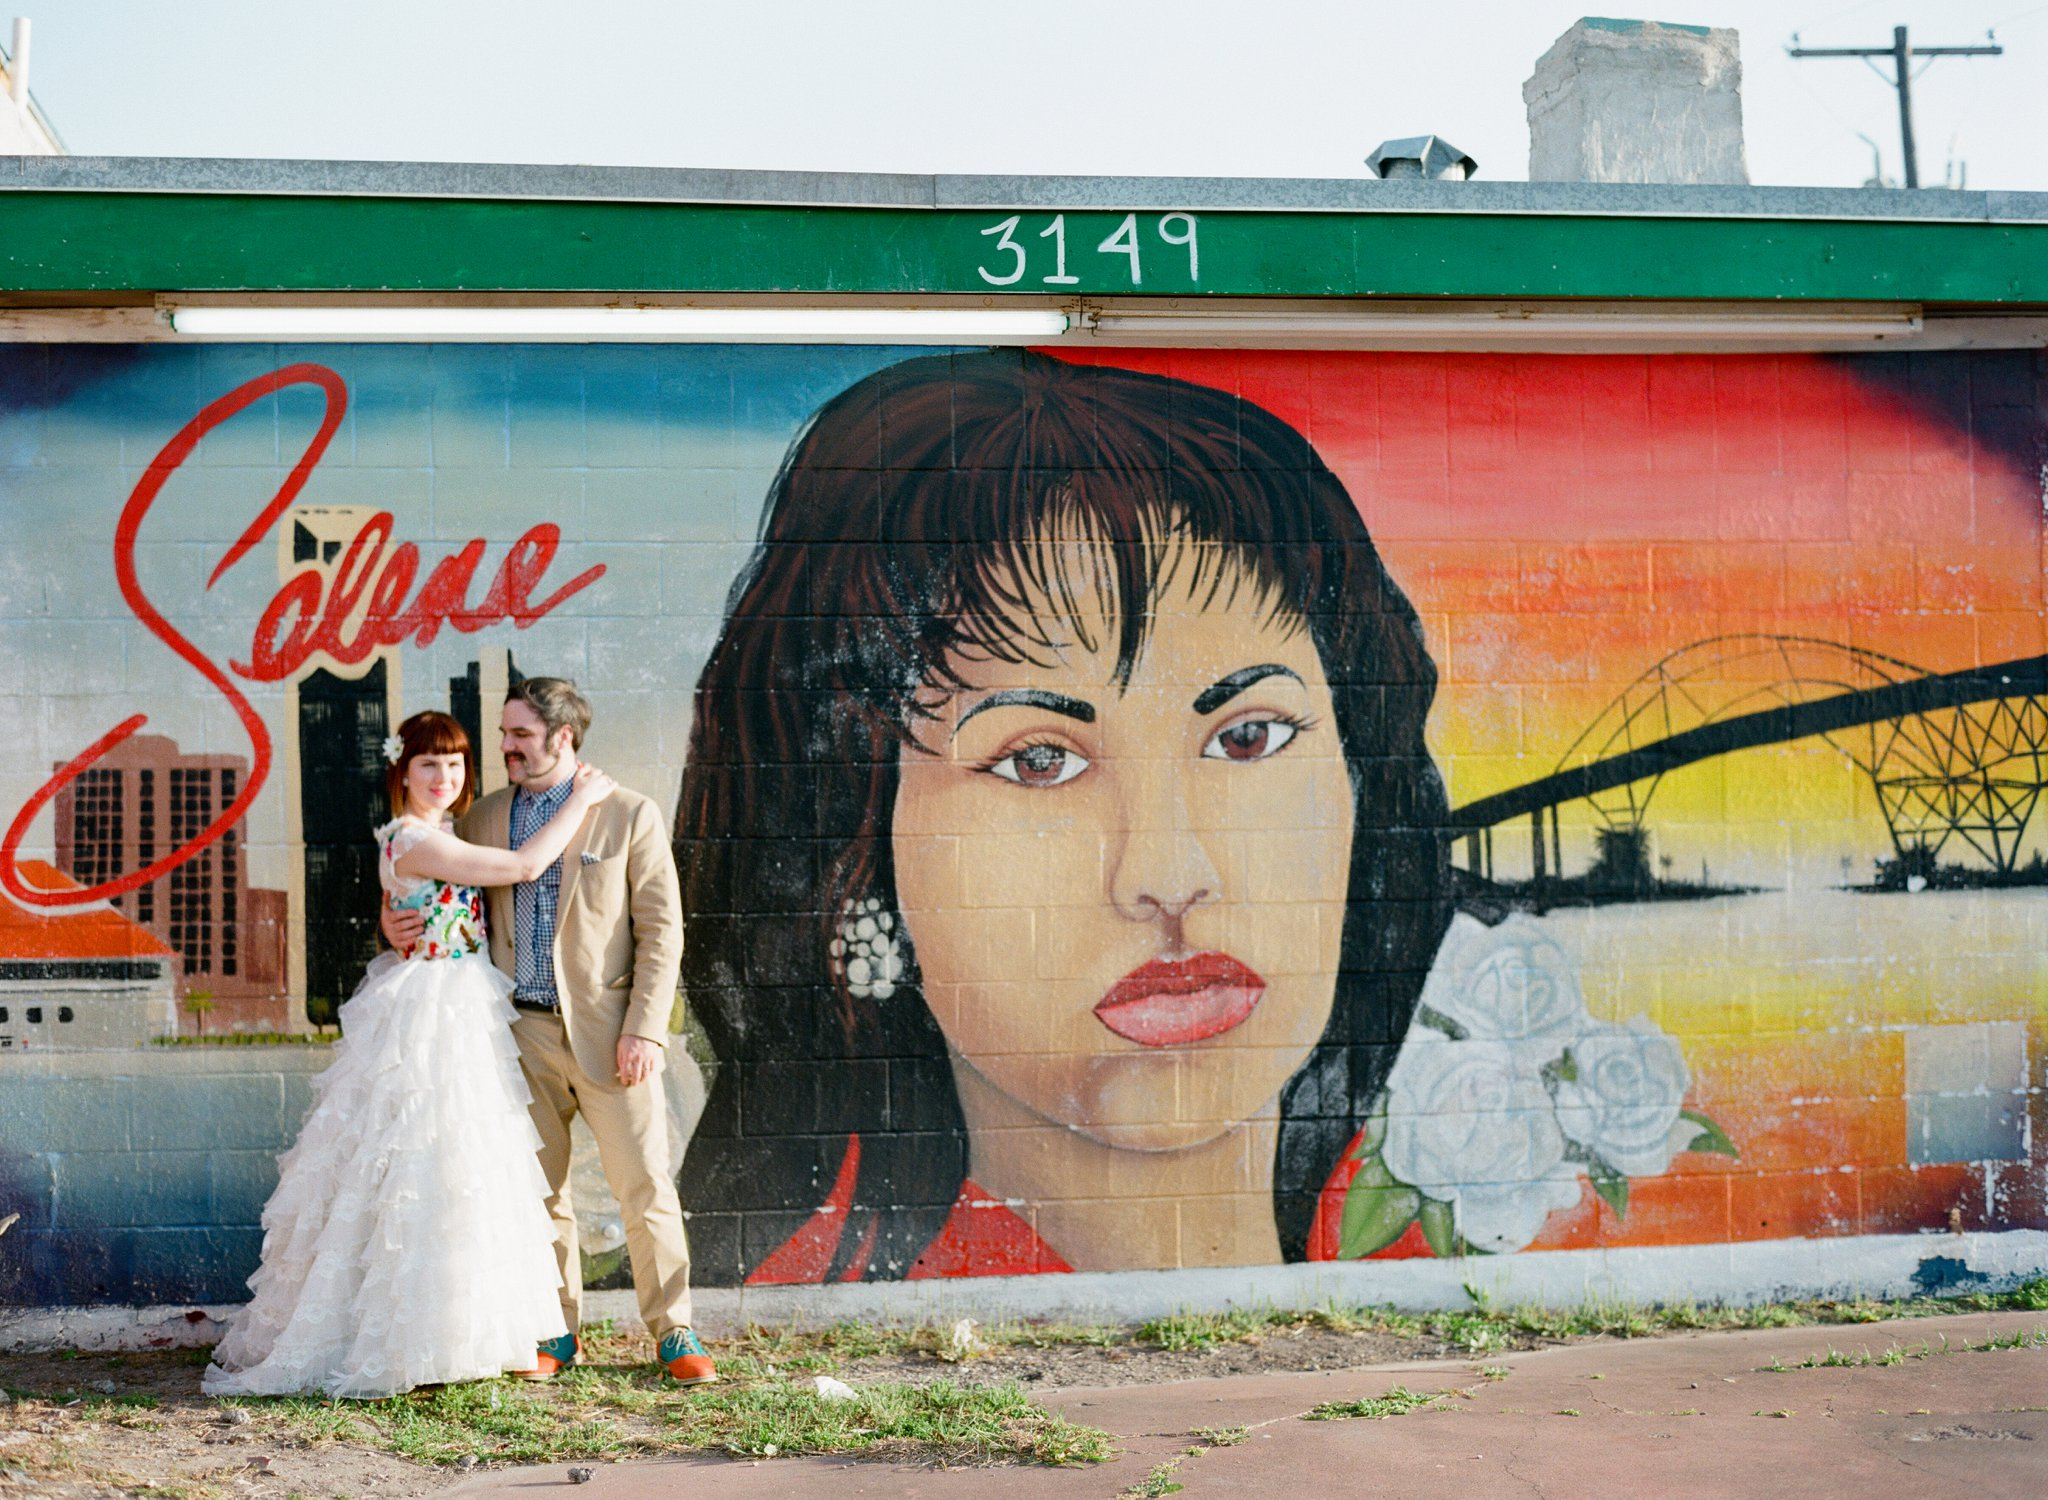 eclectic texan wedding the connoisseur of cute wedding texas wedding photographer shannon griffin photography_0005.jpg